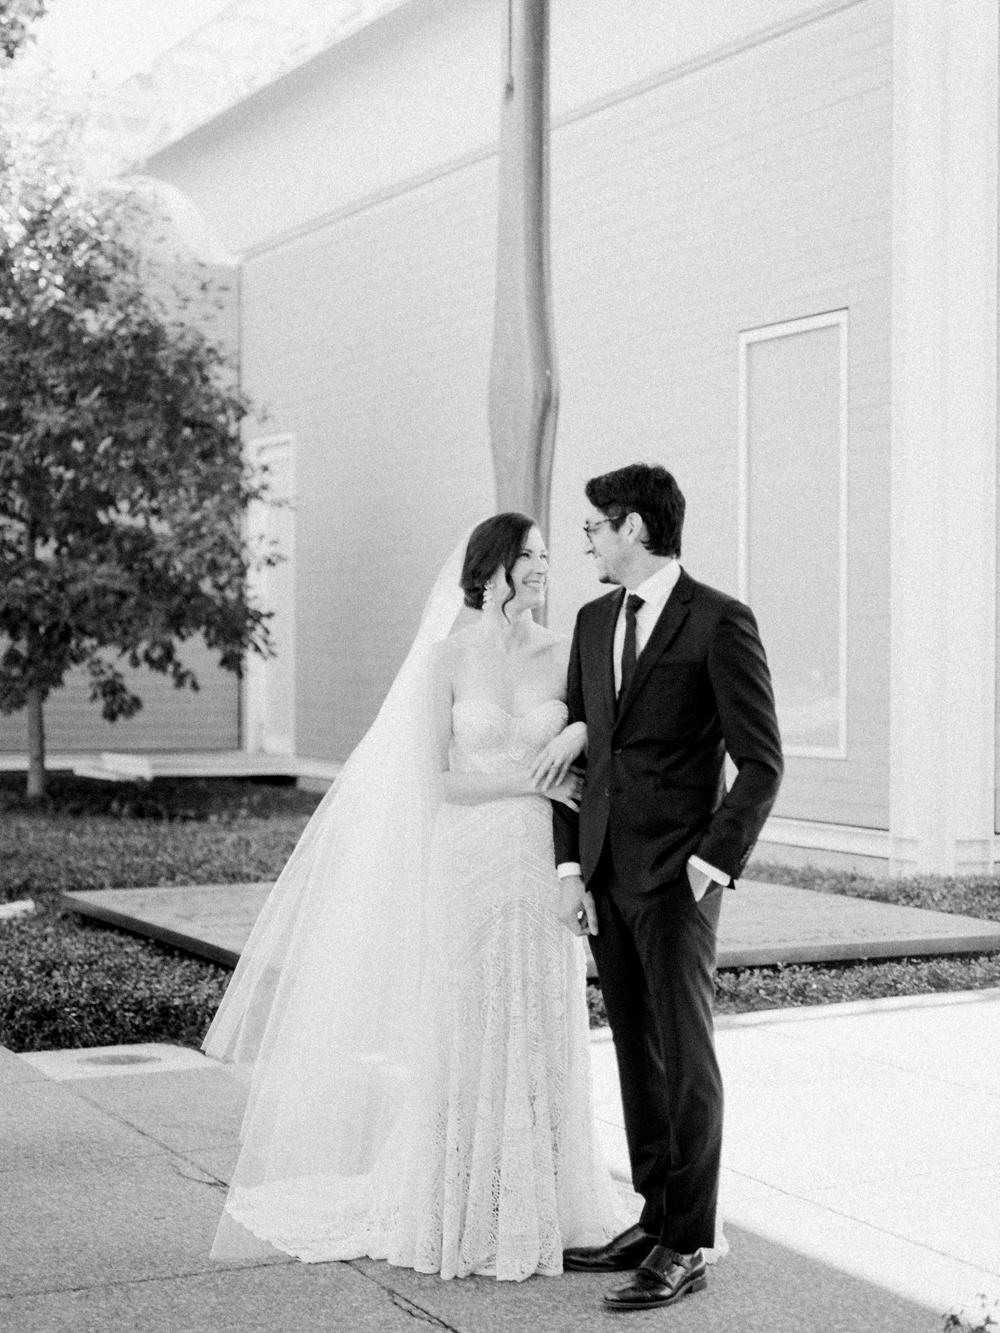 Christine Gosch - destination film photographer - houston wedding photographer - fine art film photographer - elopement photographer - destination wedding - understated wedding - simple beautiful wedding photography-59.jpg